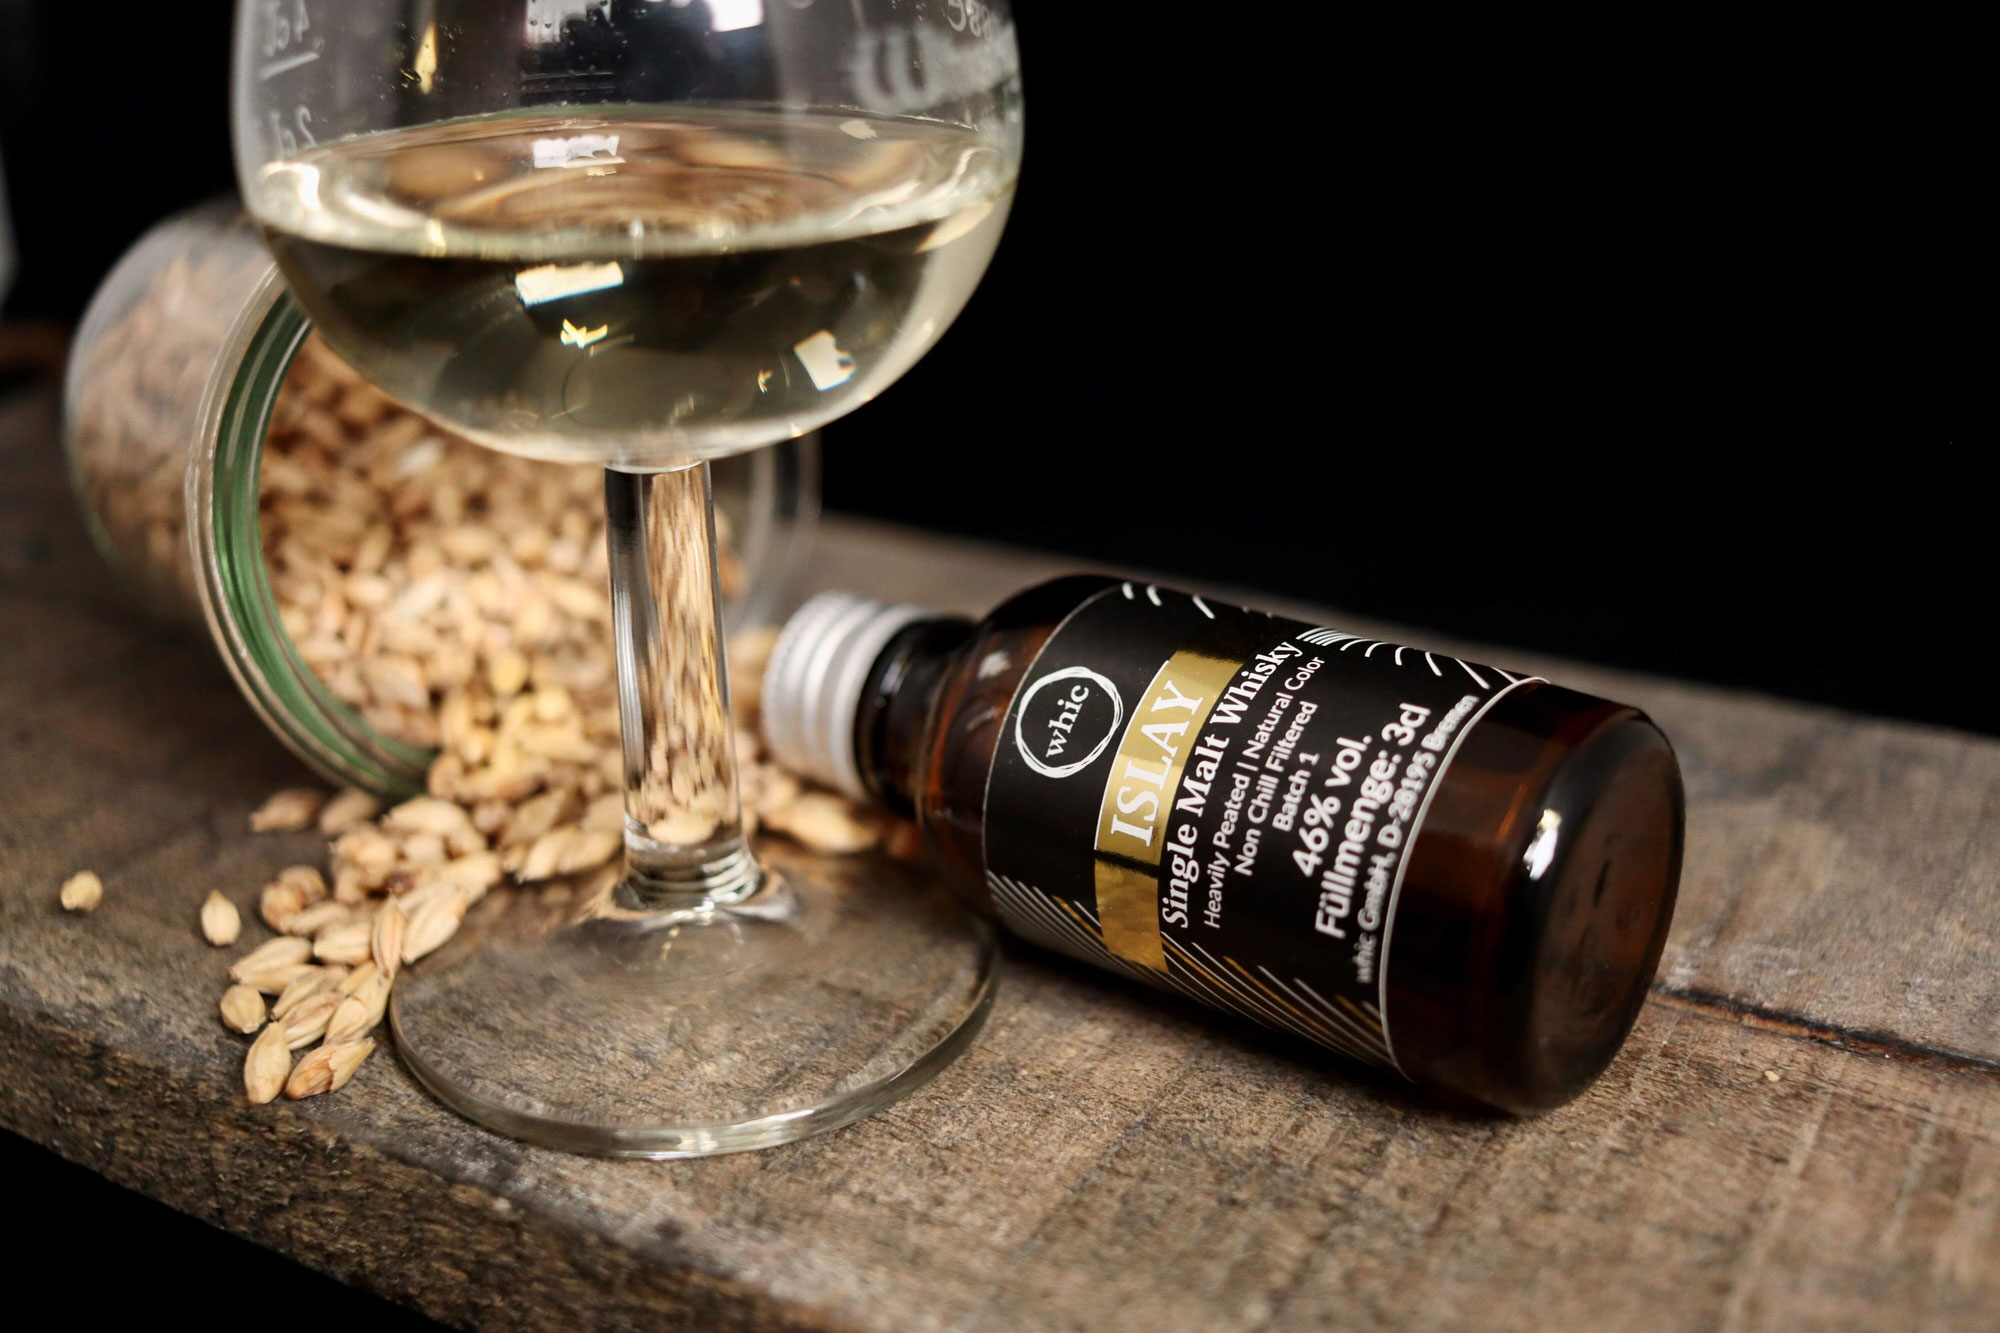 Whiskybesprechung #207: Islay Single Malt Whisky von whic.de